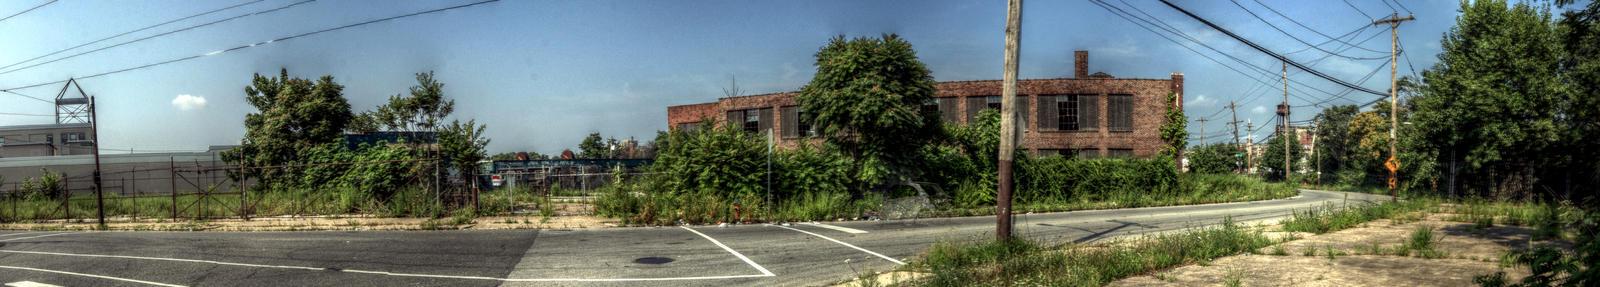 Panorama 3717 hdr pregamma 1 mantiuk06 contrast ma